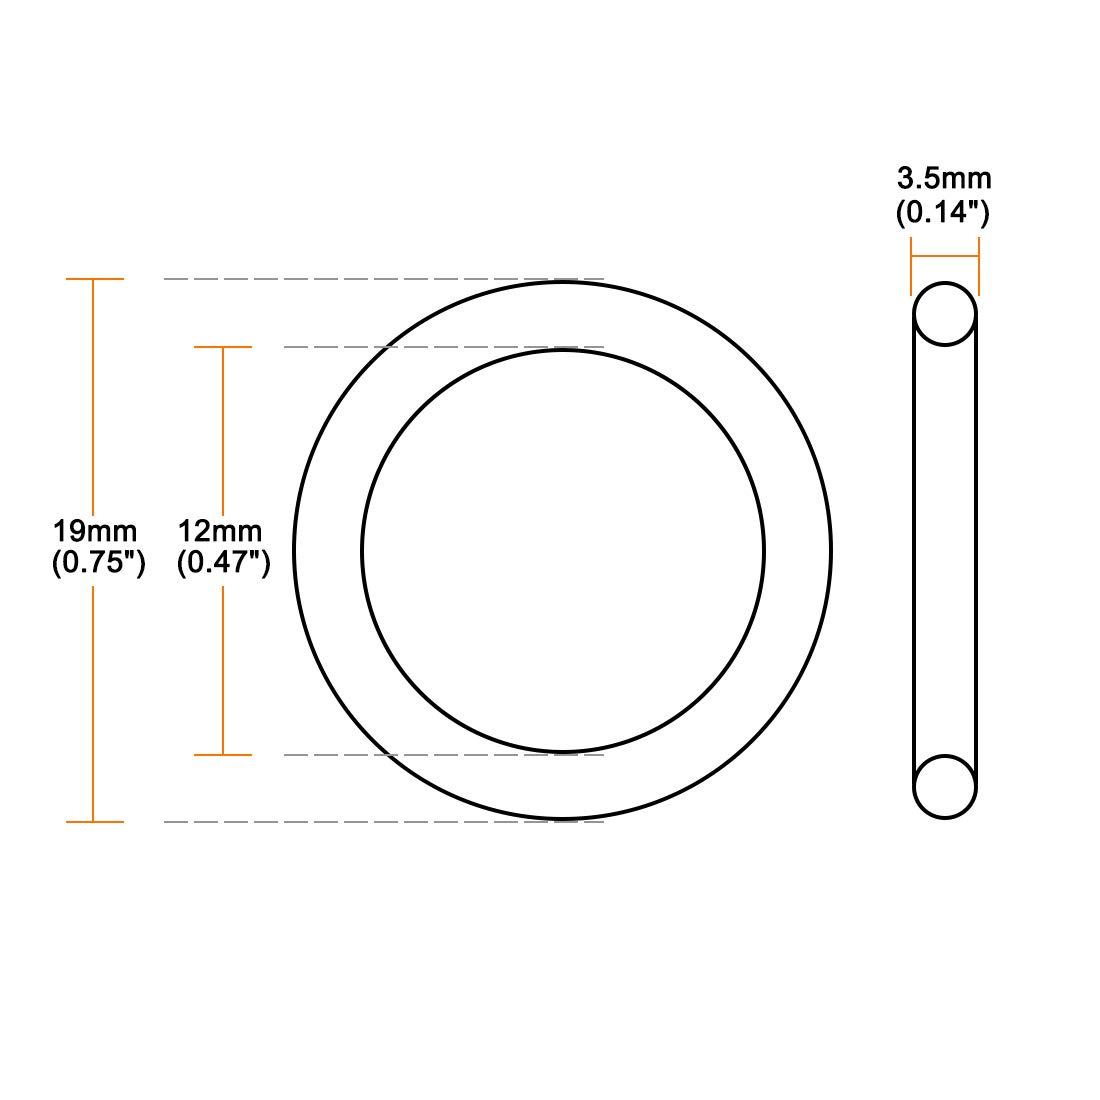 3,5mm Breite sourcing map 20 Stk 16mm Innendurchmesser O Ringe Nitrile Gummidichtung